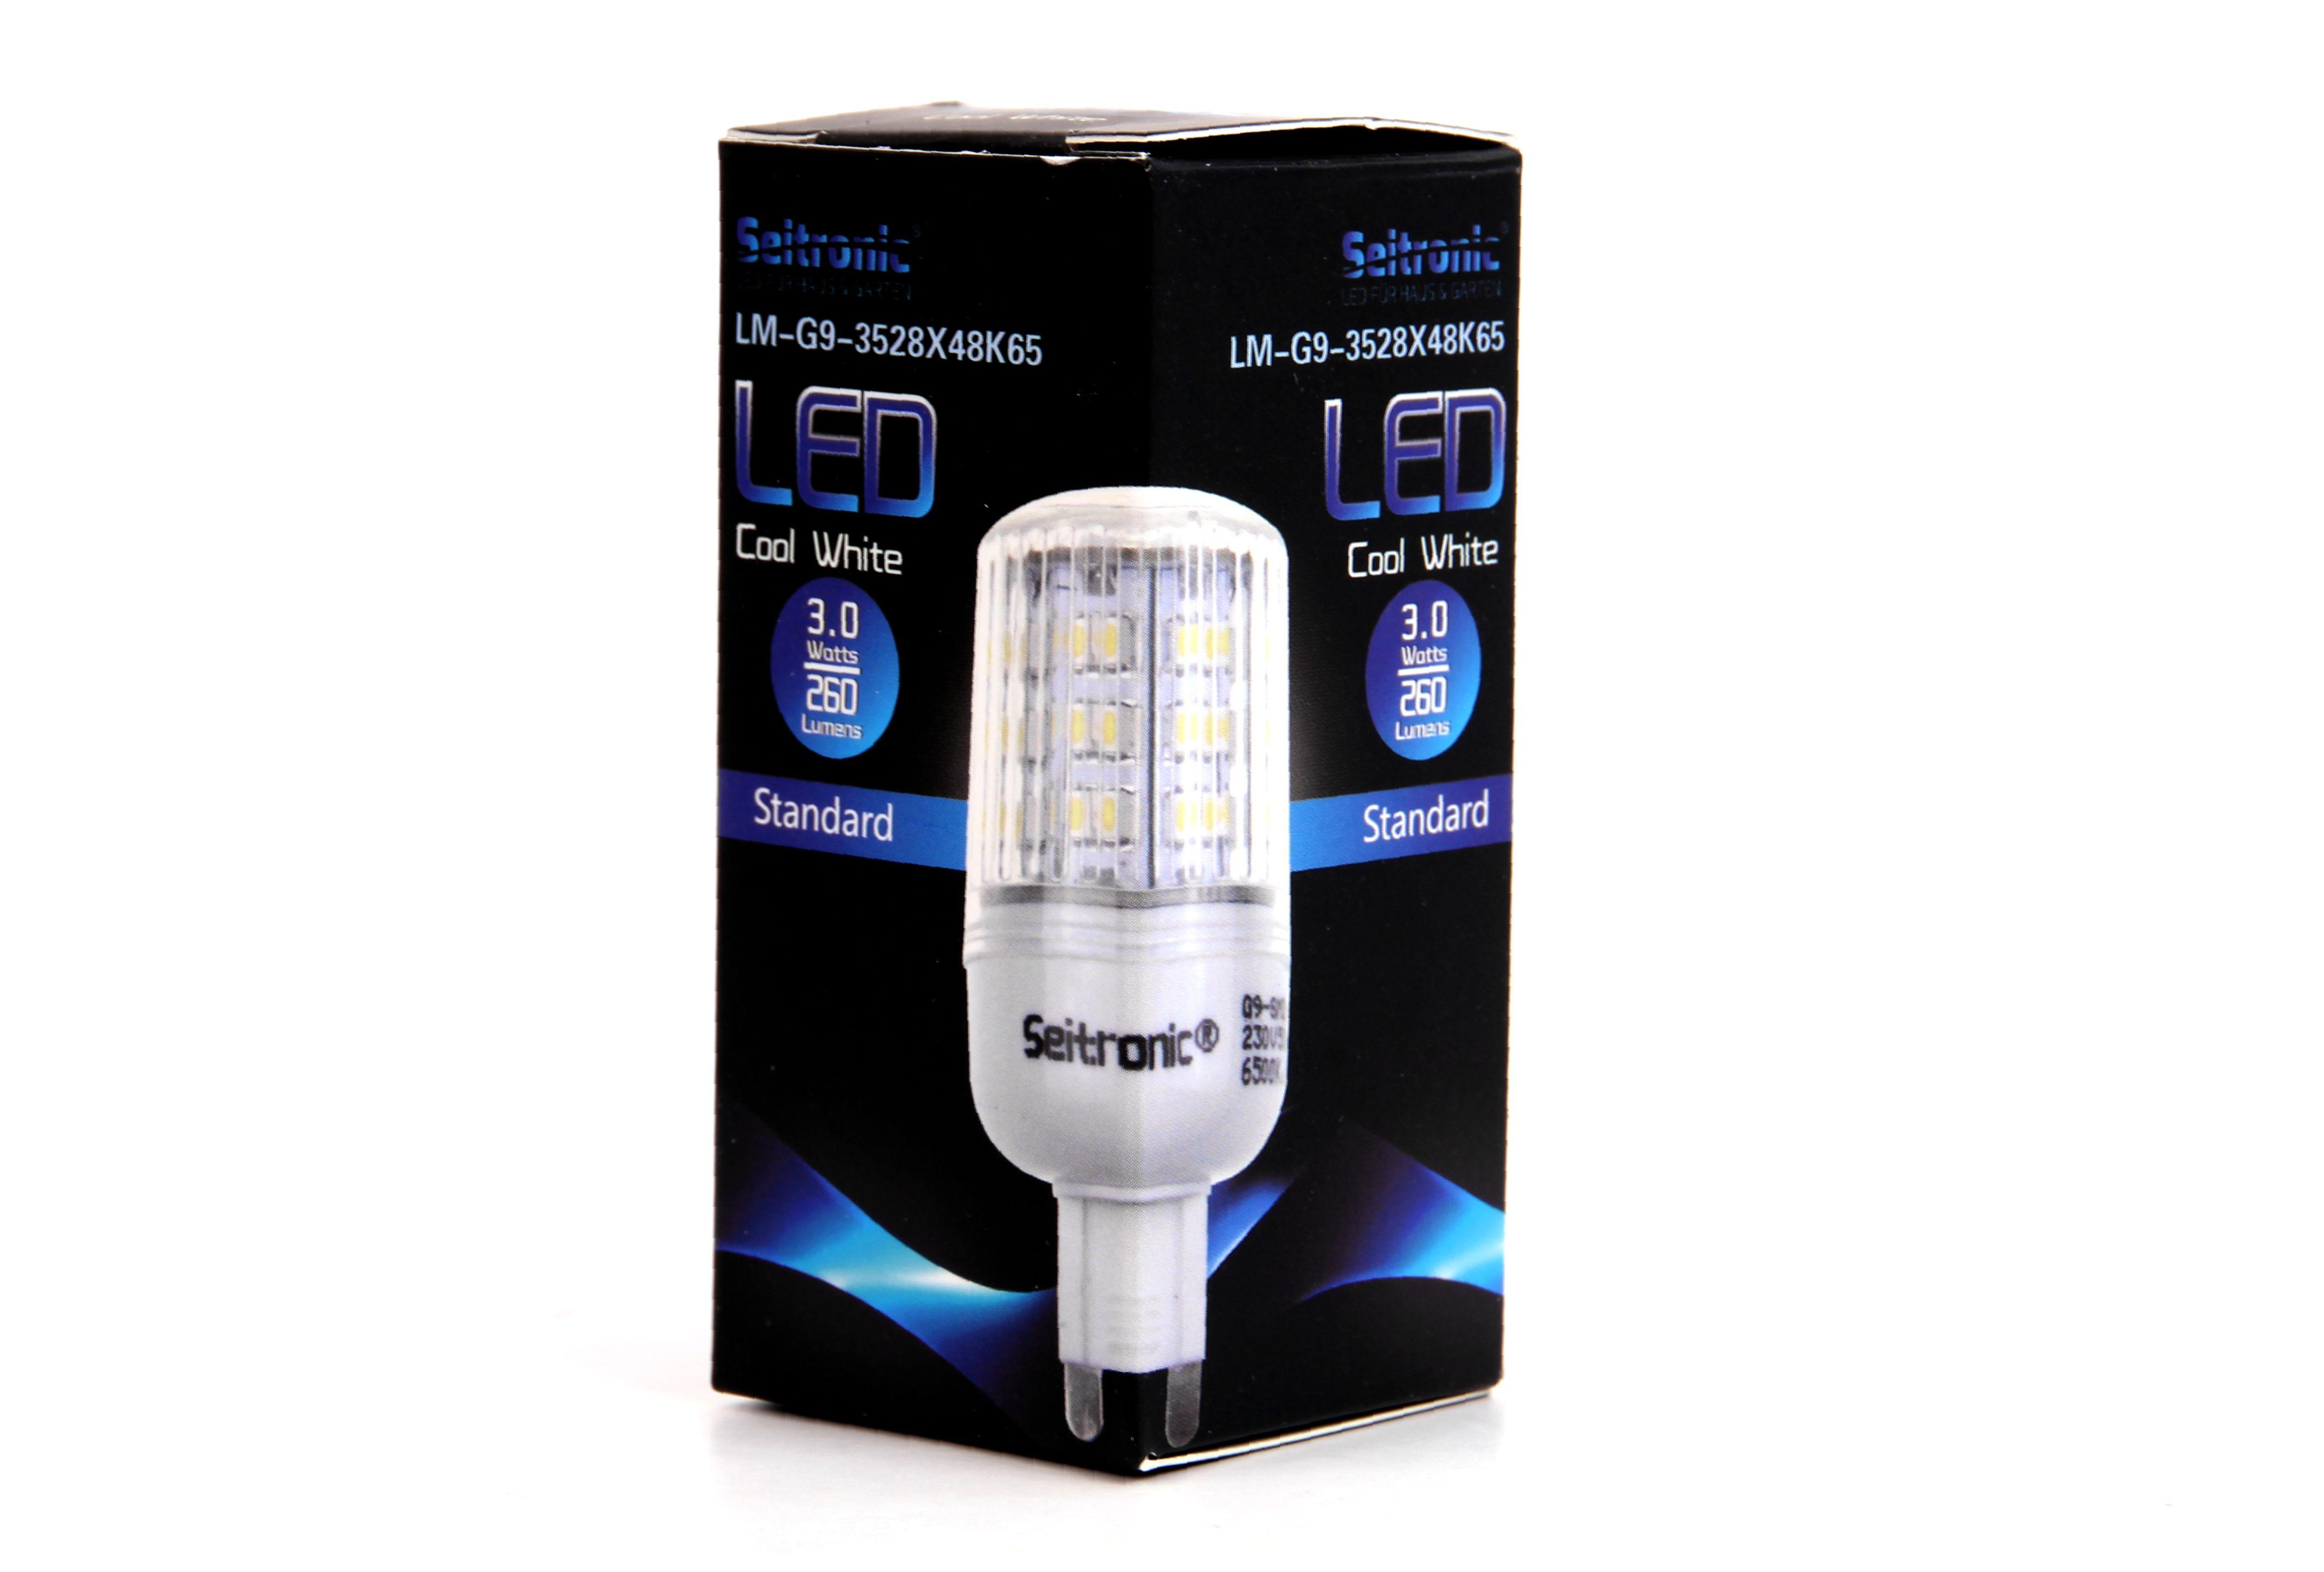 G9 LED Lampe Seitronic mit 3 Watt 48 LED Kalt weiß